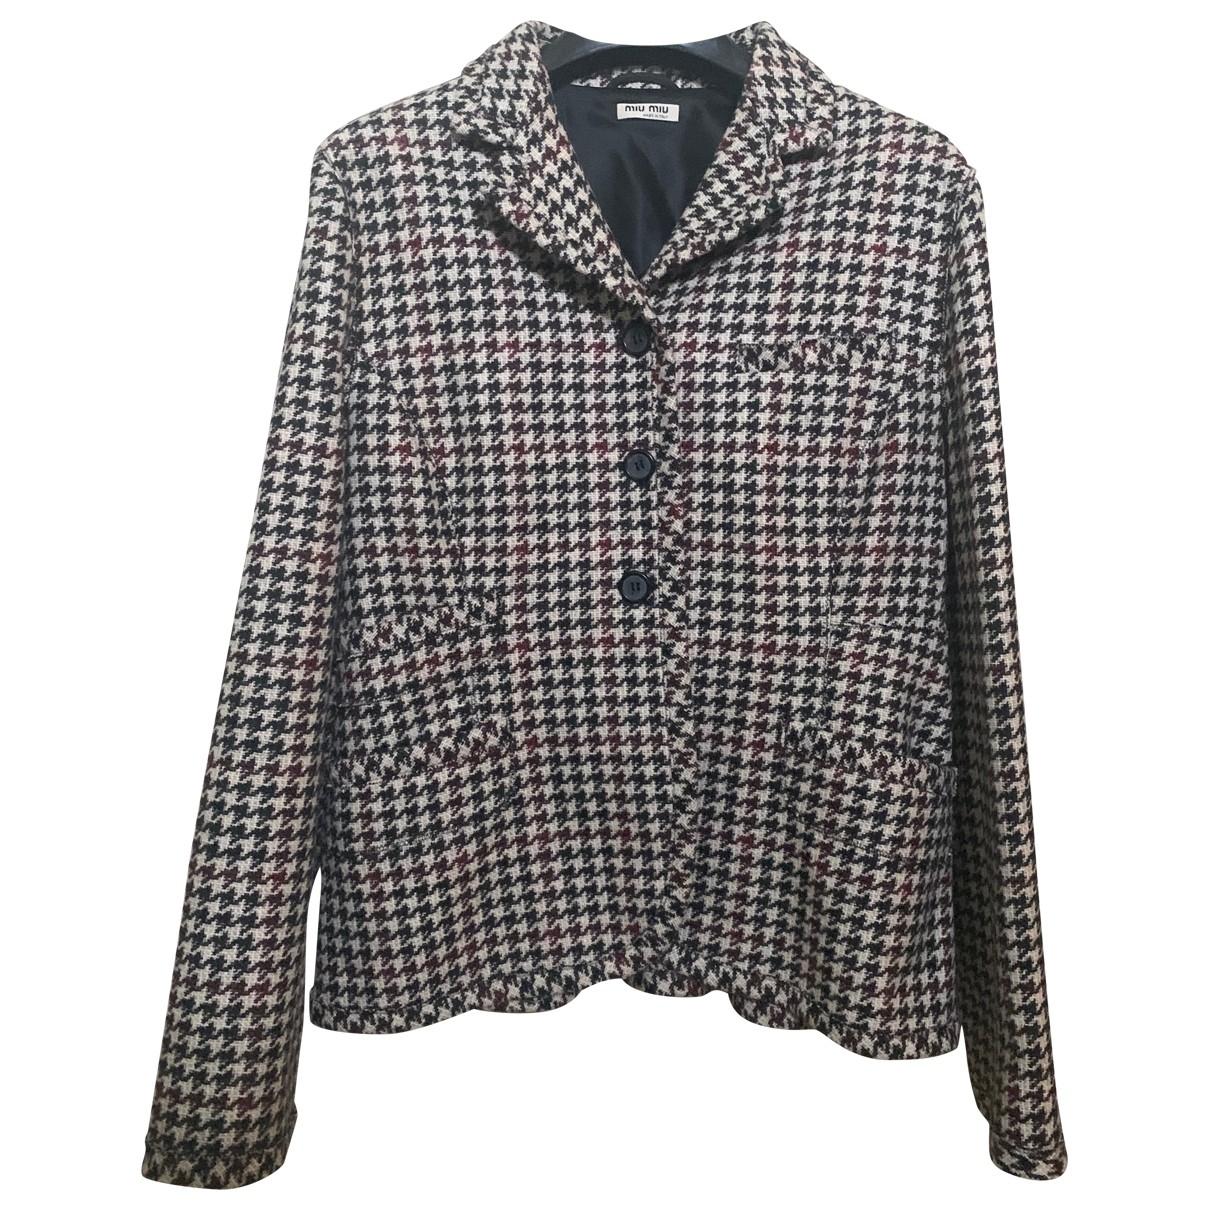 Miu Miu \N Beige Cashmere jacket for Women 44 IT